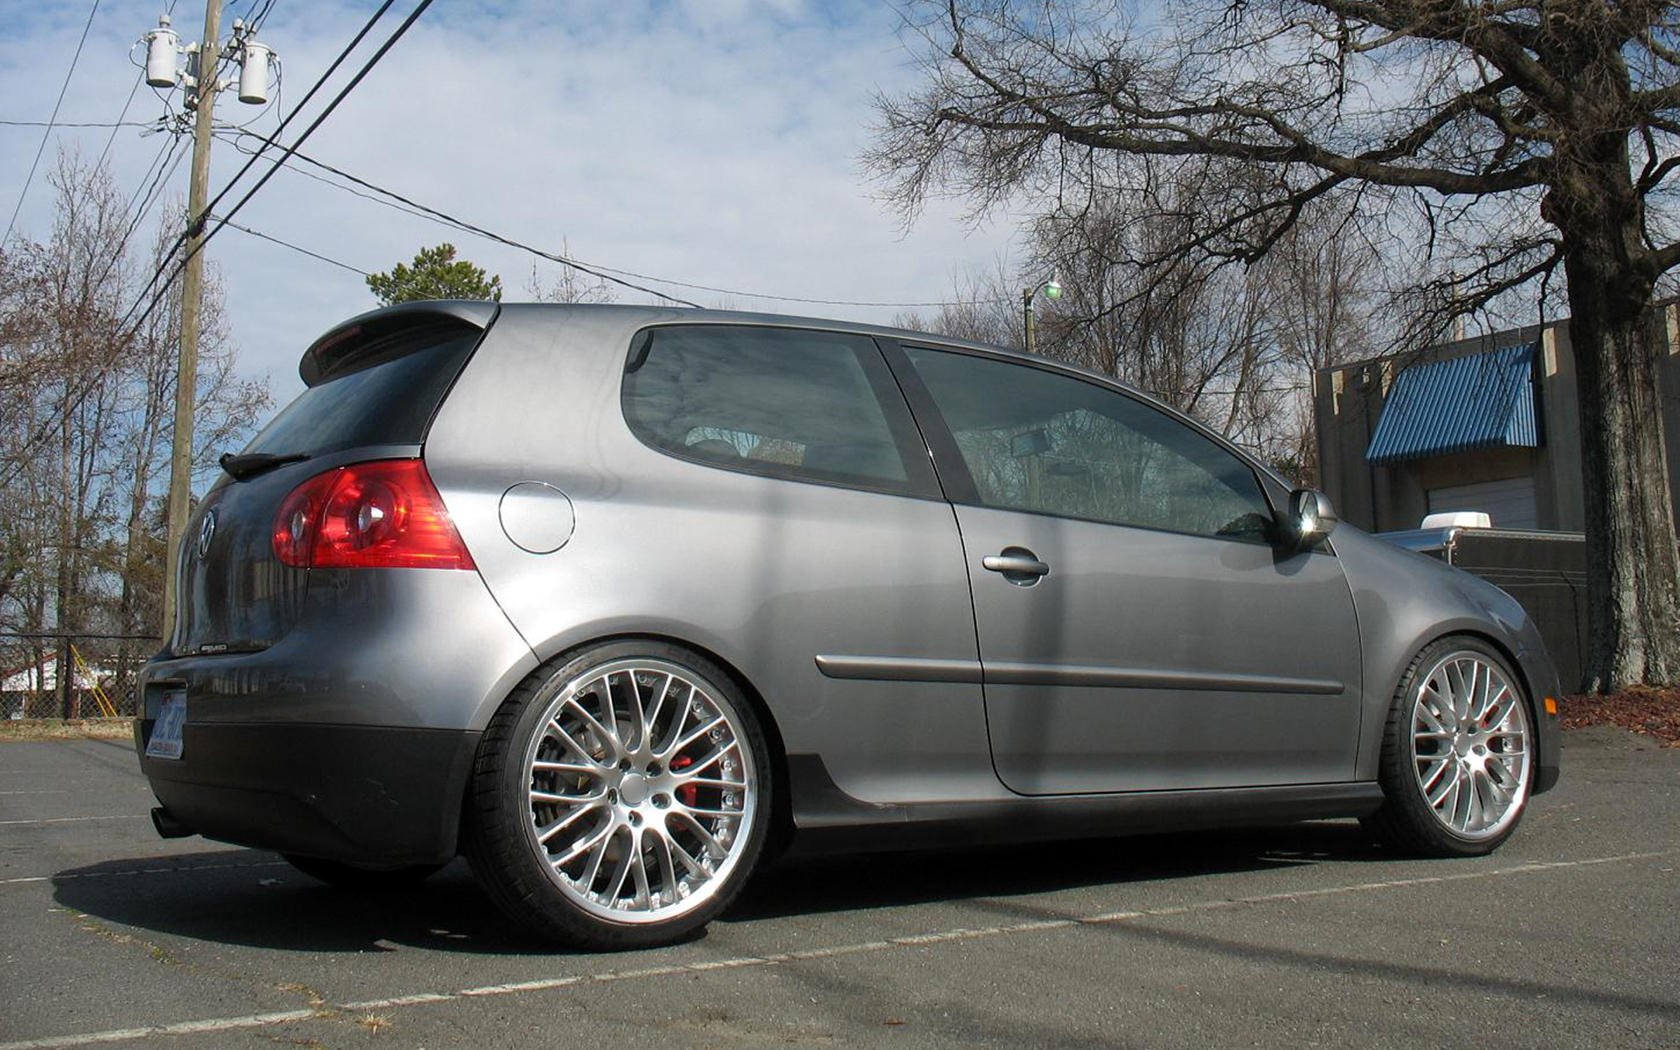 Hartmann Euromesh 3-GS:ML Wheels for Volkswagen fitment - Hartmann Wheels